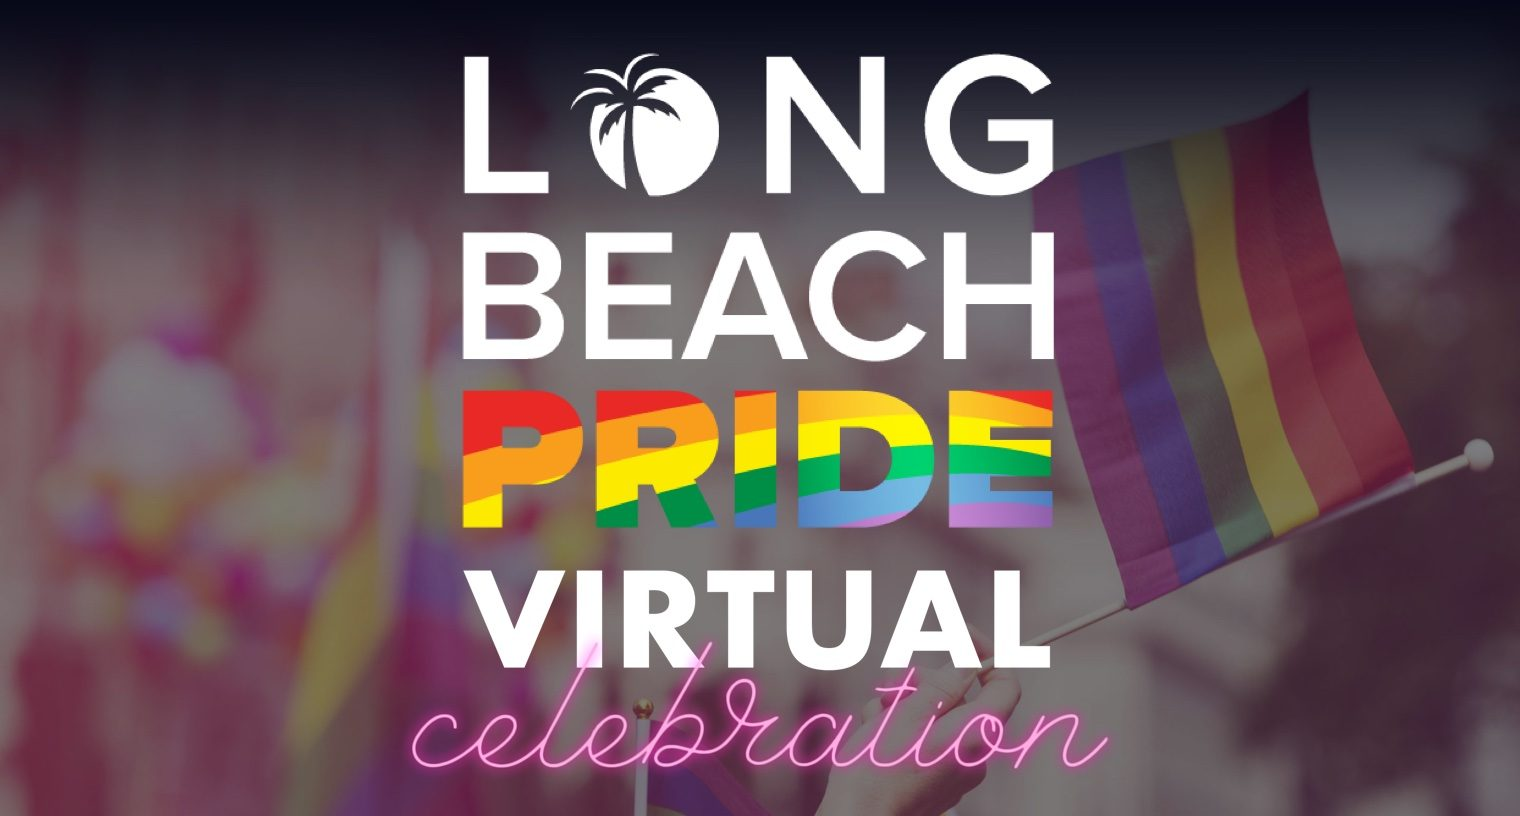 Long Beach Pride 2021